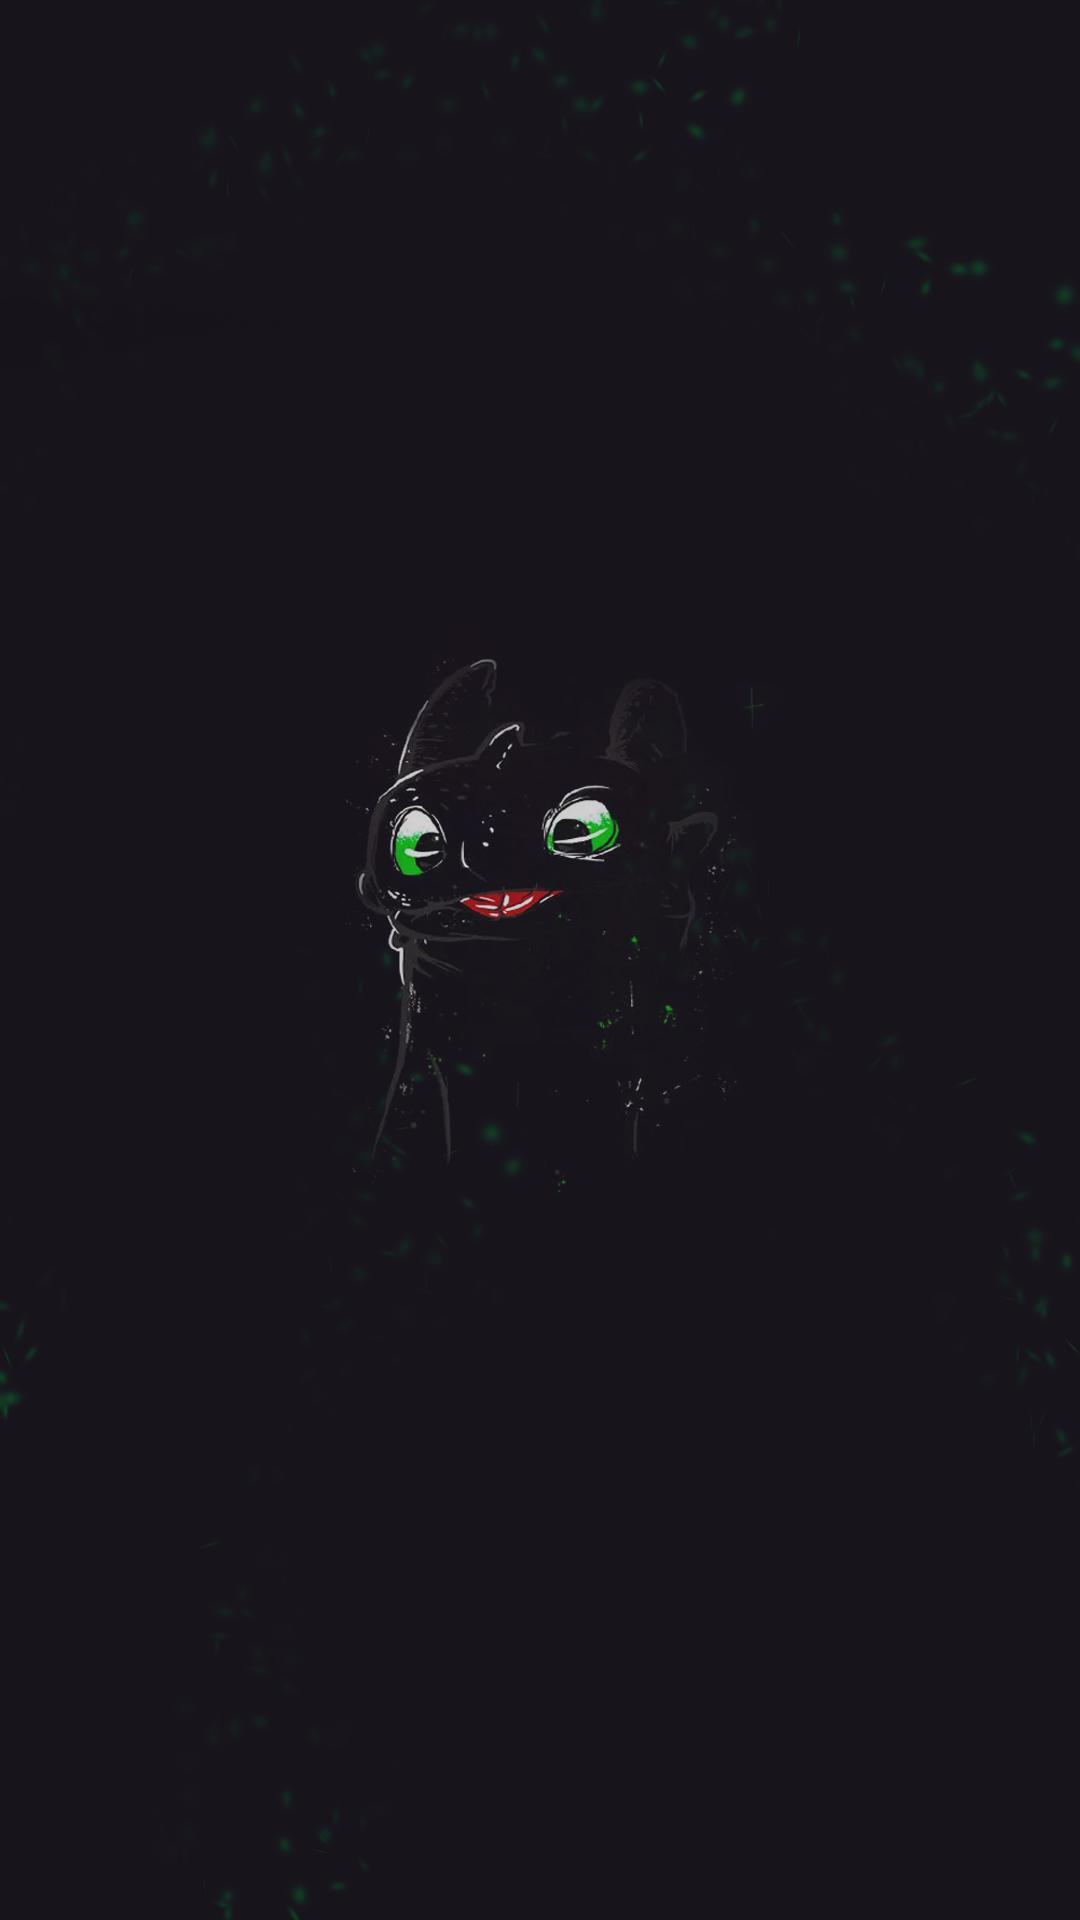 Toothless (Night Fury) - Cellphone wallpaper 1080x1920 https://br.pinterest